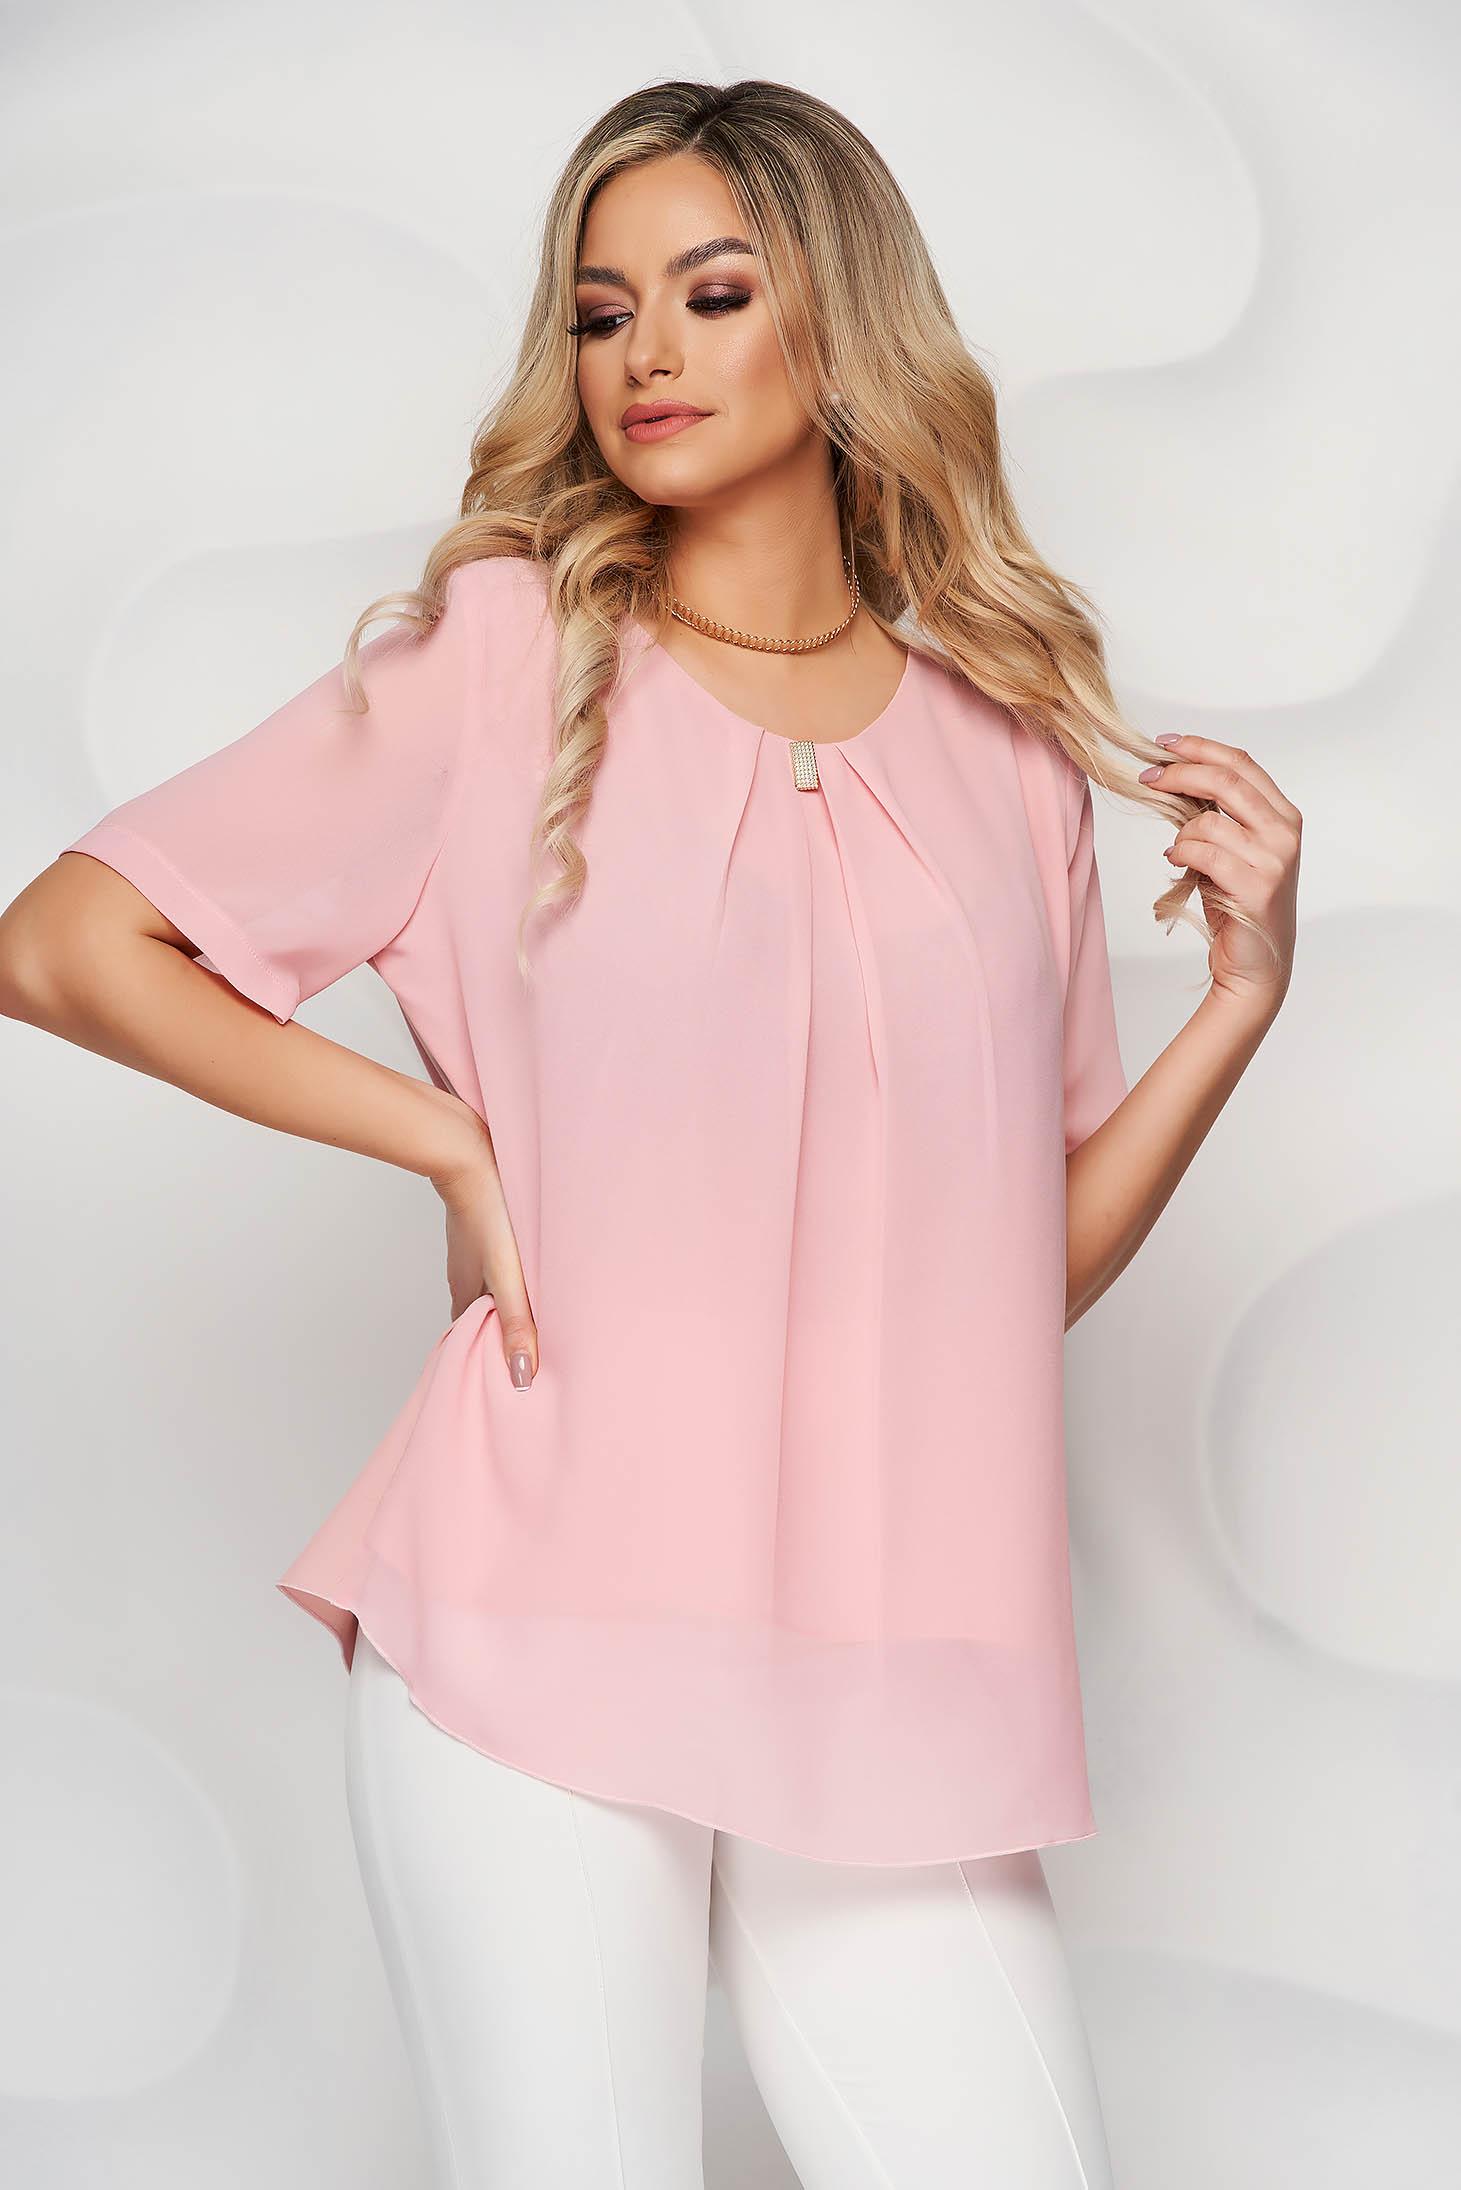 Peach women`s blouse office short cut from veil fabric short sleeves